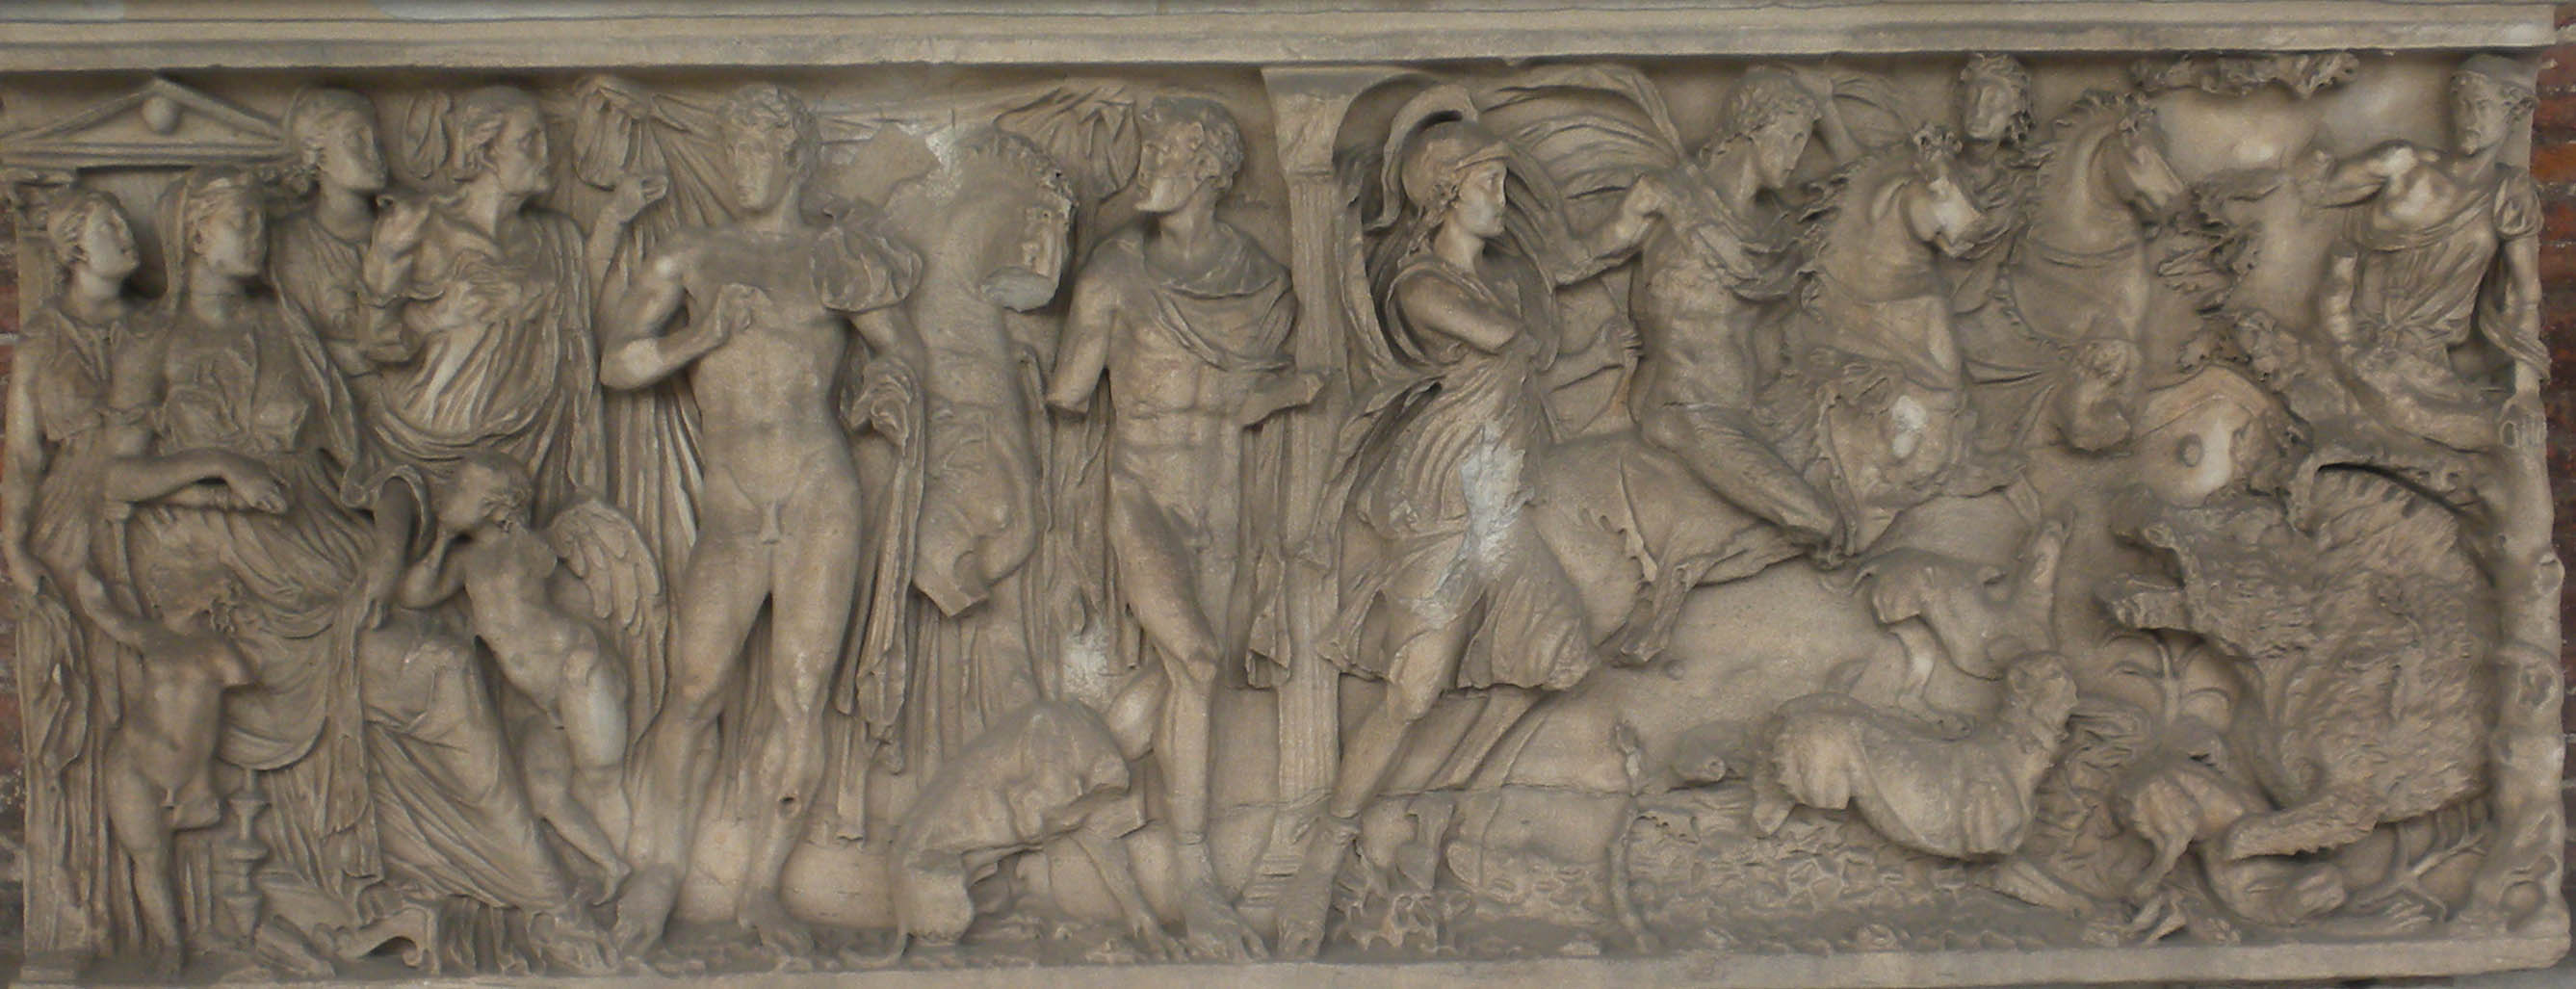 Romersk sarkofag visende myten om Faidra og Hippolytos.